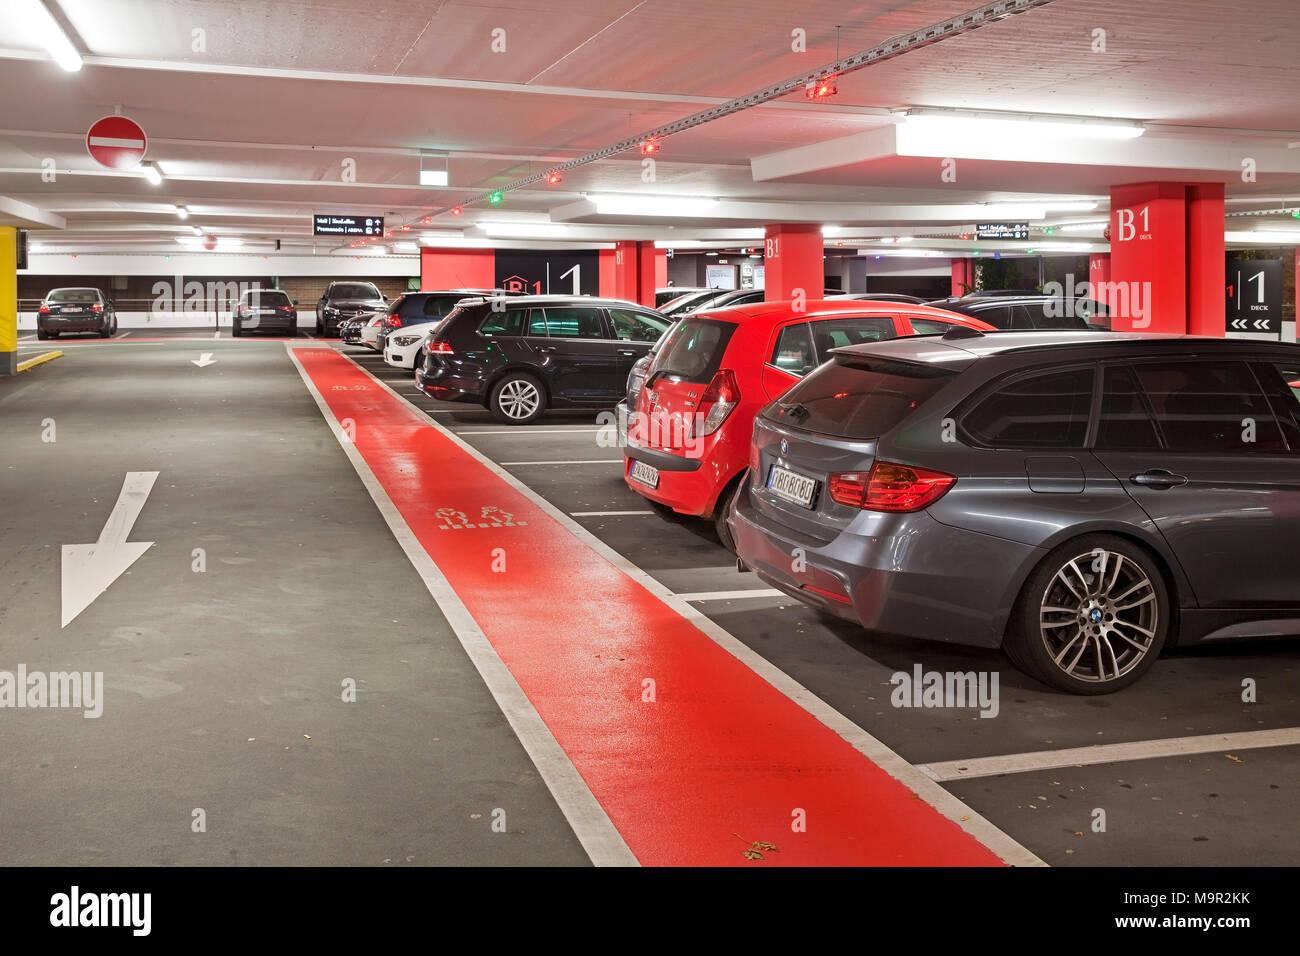 Parking cars in underground car park, multi-storey car park, Centro, Oberhausen, Ruhr Area, North Rhine-Westphalia, Germany Stock Photo